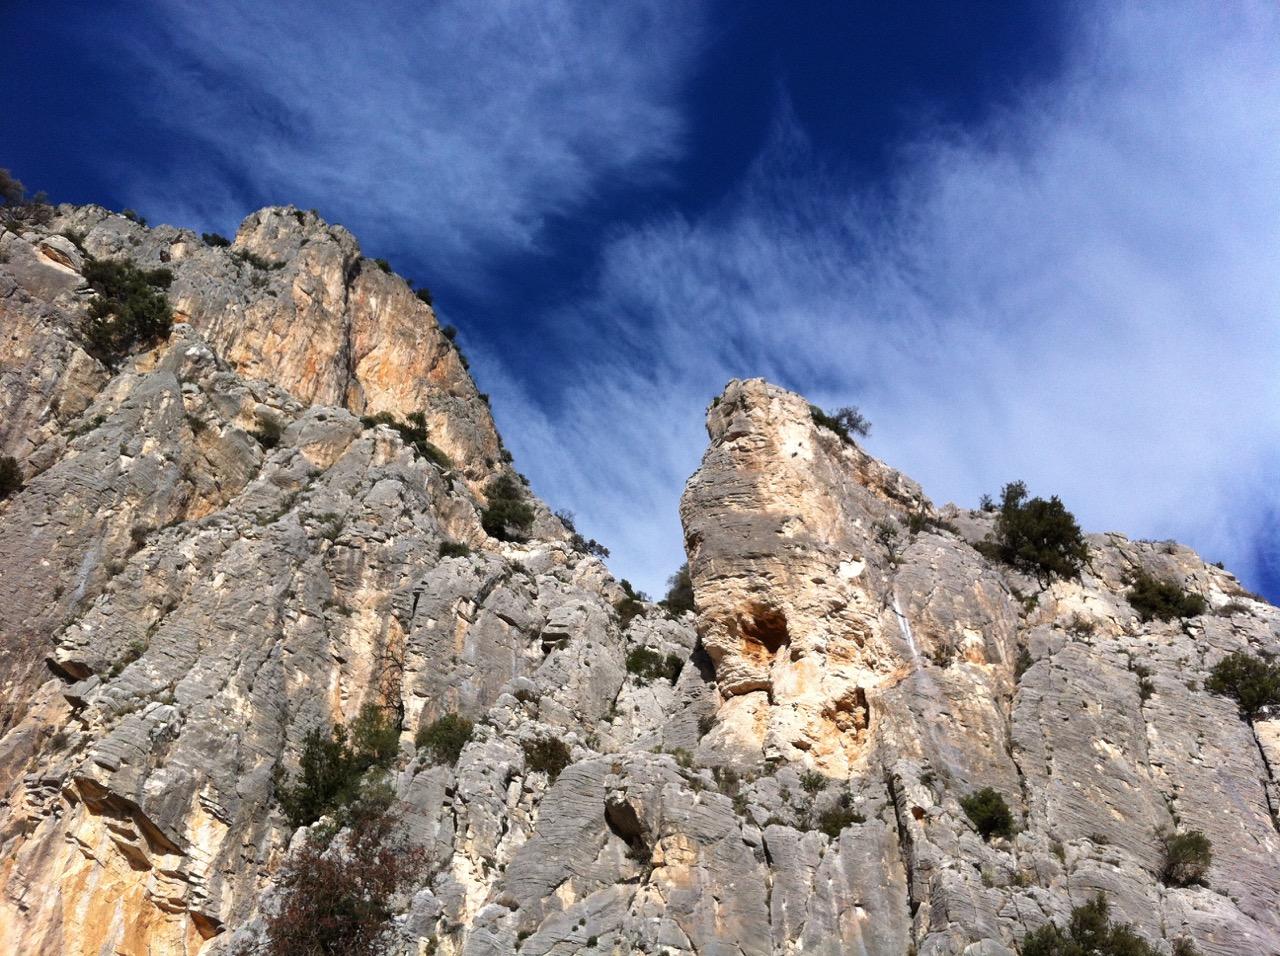 Wanderung nach Baunei: imposante Felswände